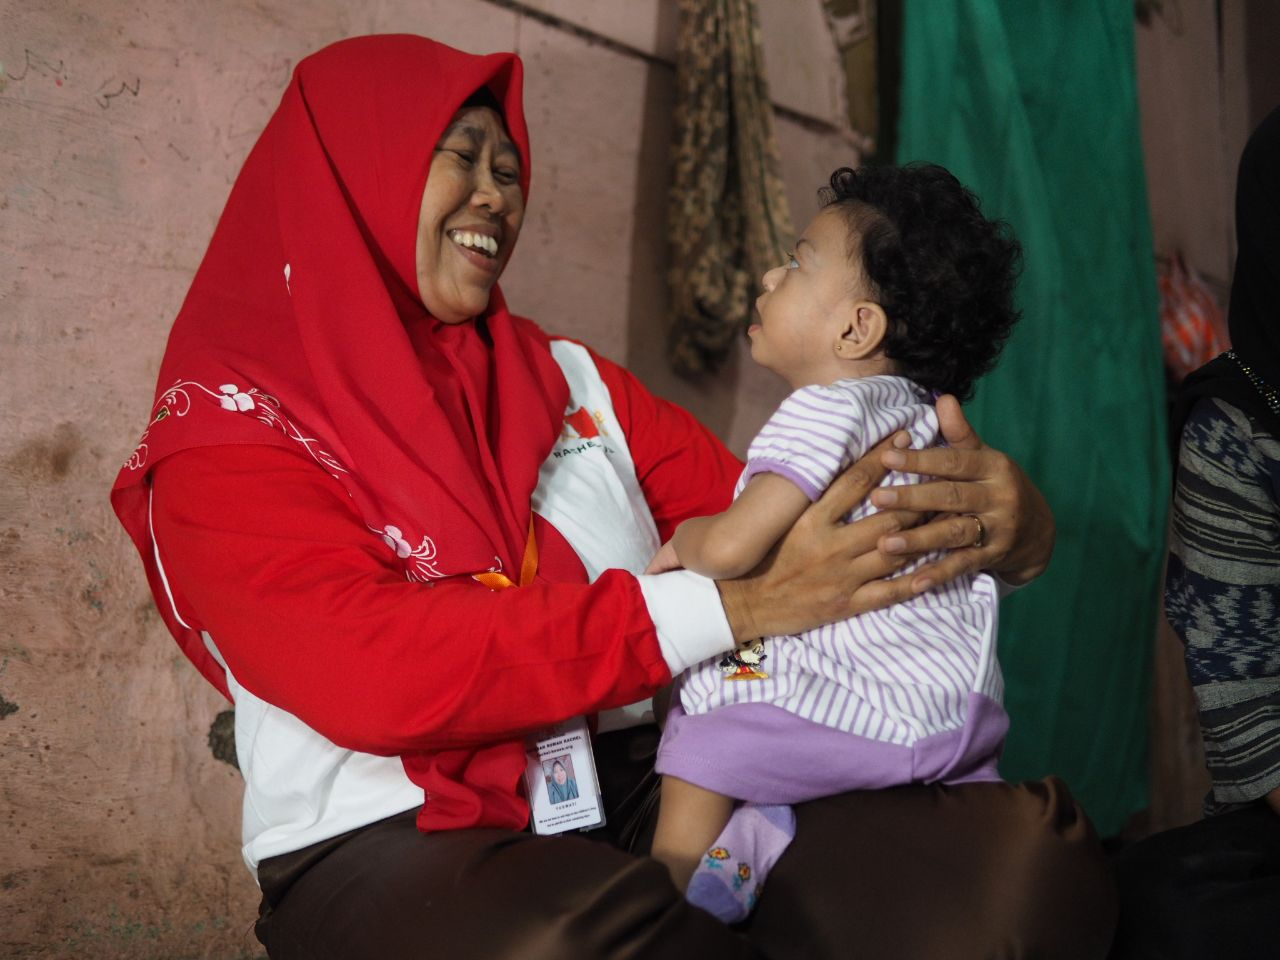 Rachel House Community-Based Palliative Care volunteer with patient. Photo by Kartika Kurniasari.